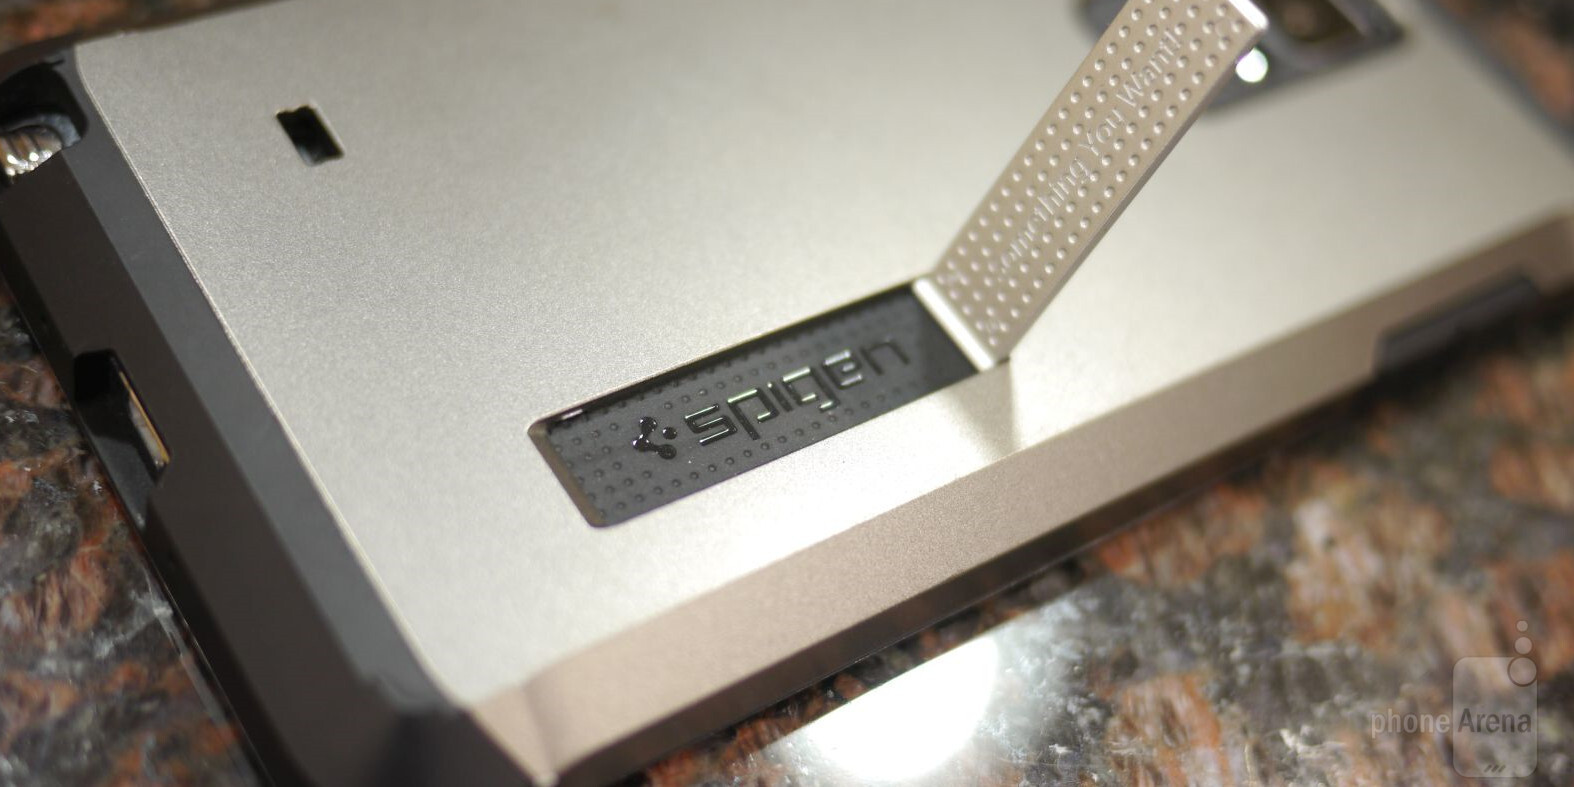 online store aa2a1 d01c0 Spigen Tough Armor Case for Samsung Galaxy Note 4 Review - PhoneArena